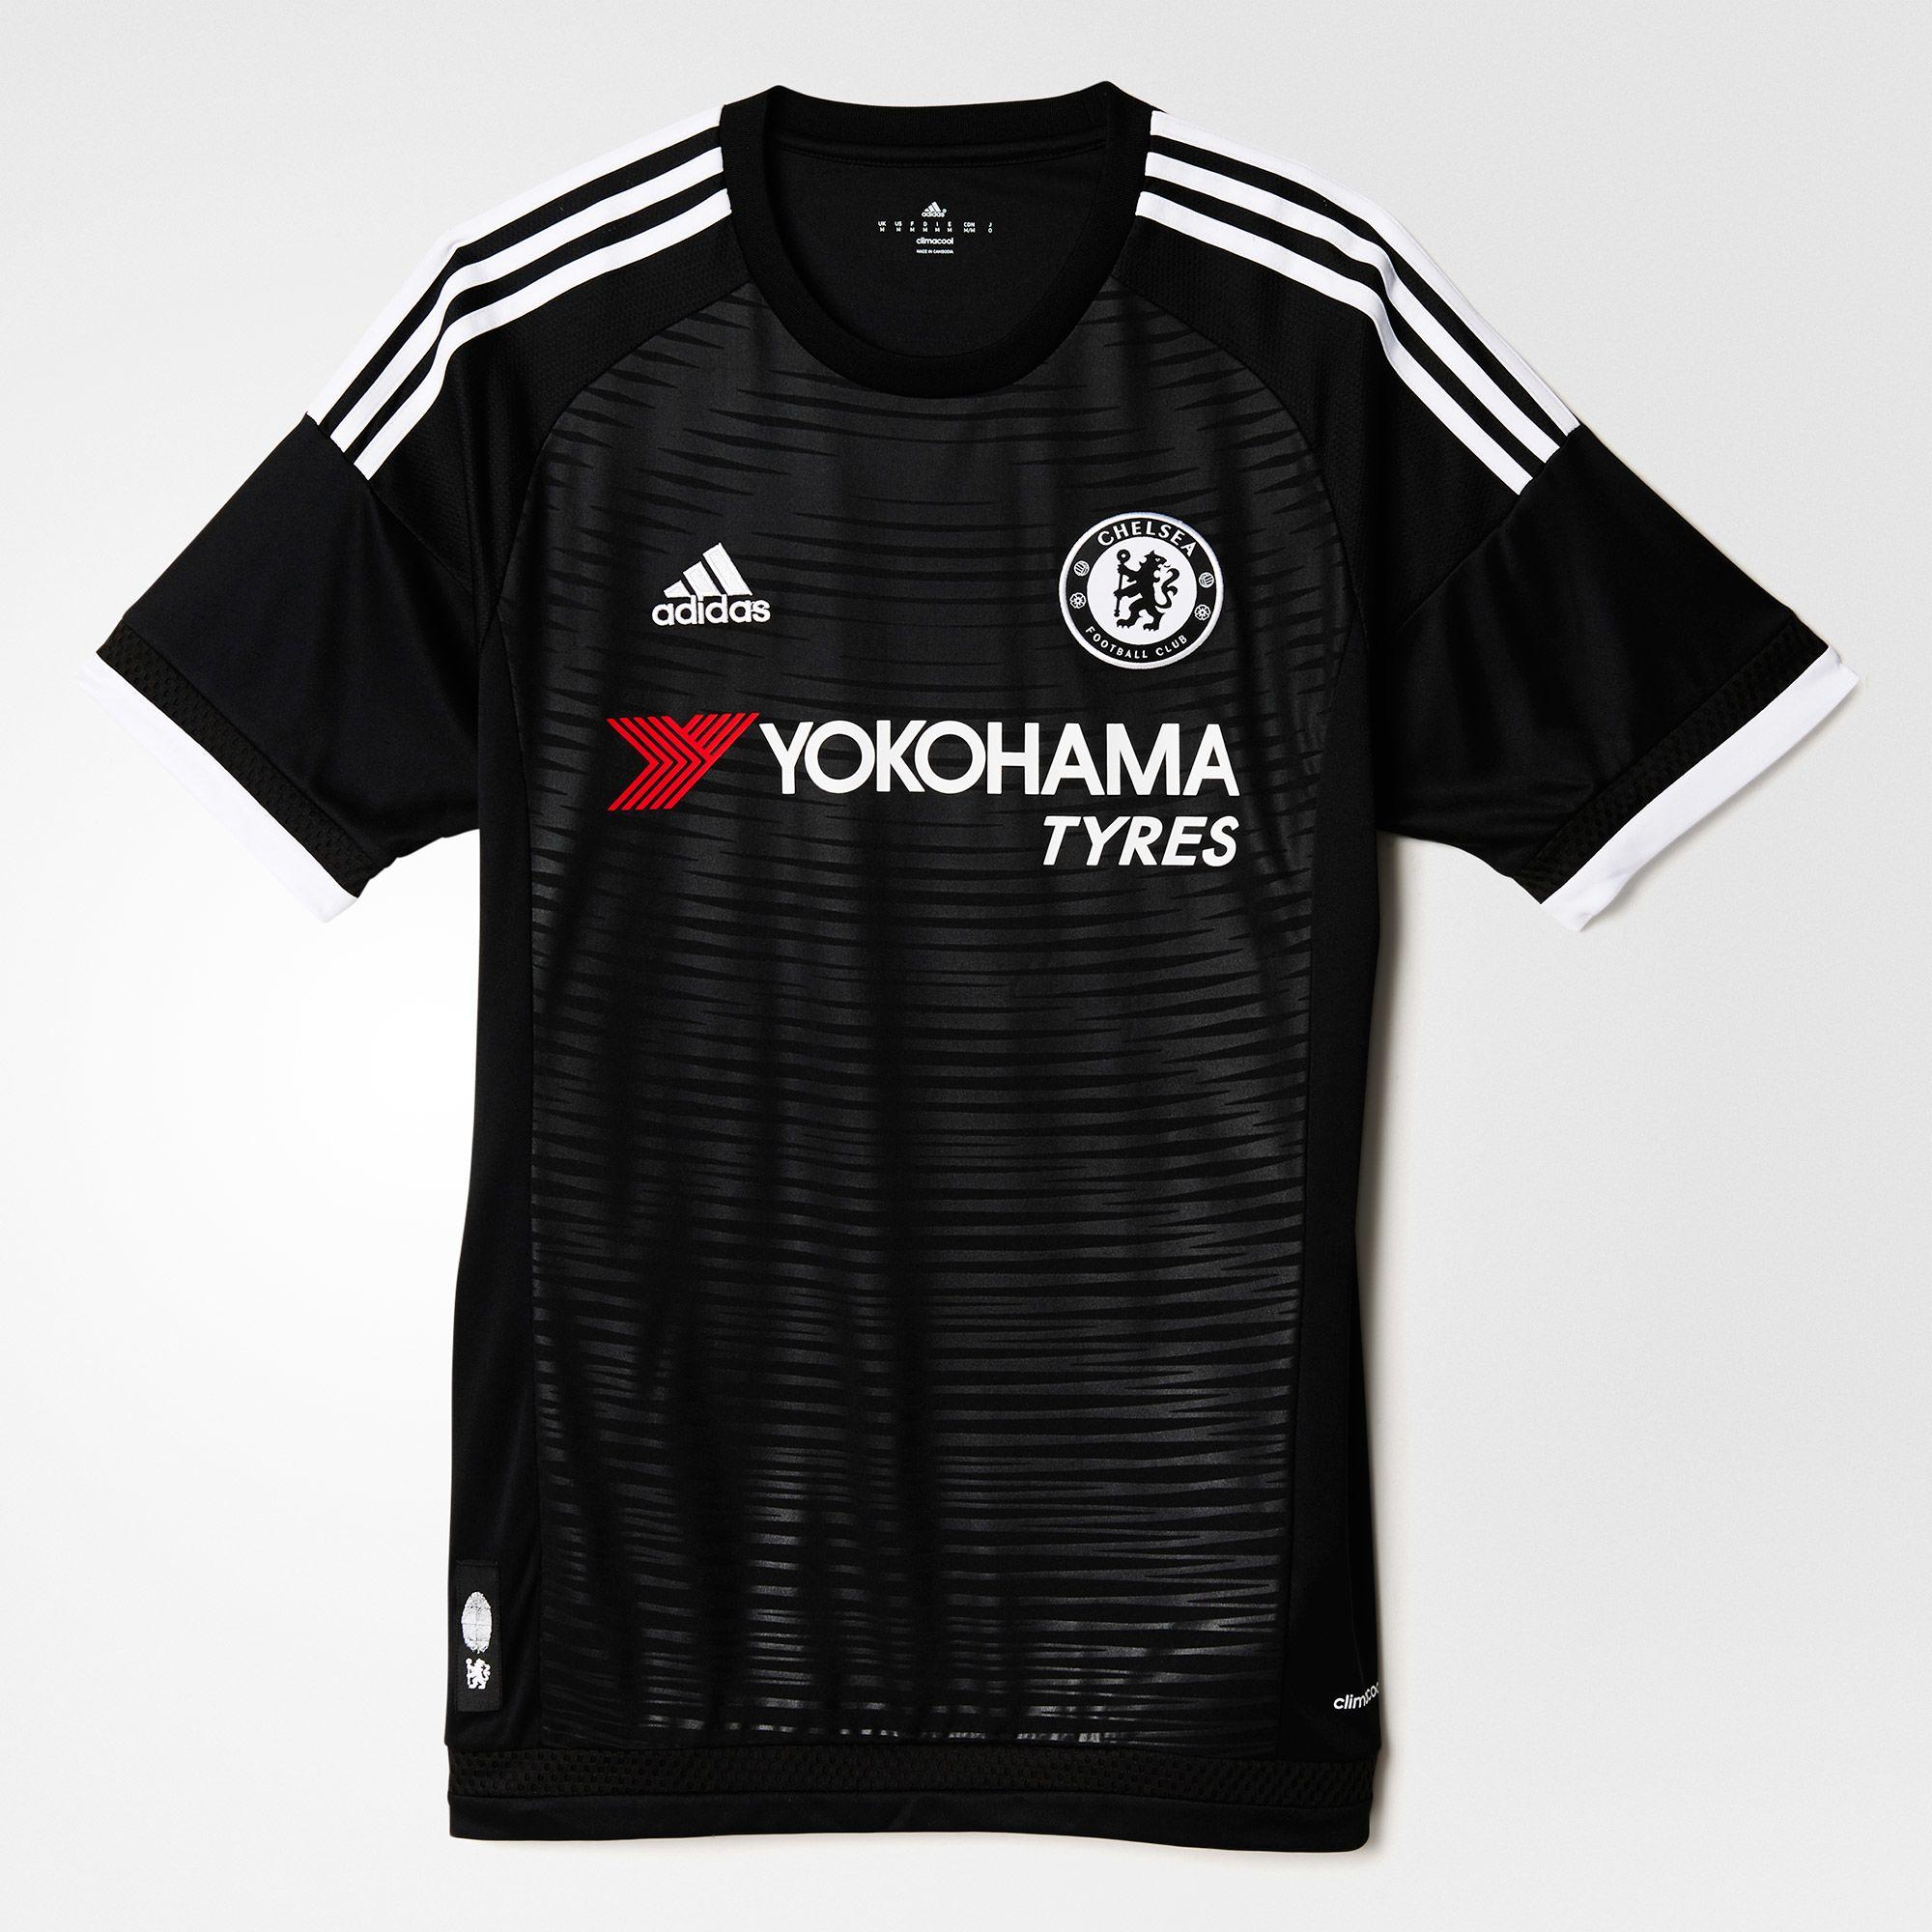 brand new 54156 b5666 adidas Chelsea 3rd Jersey 2015/16 - Black/White